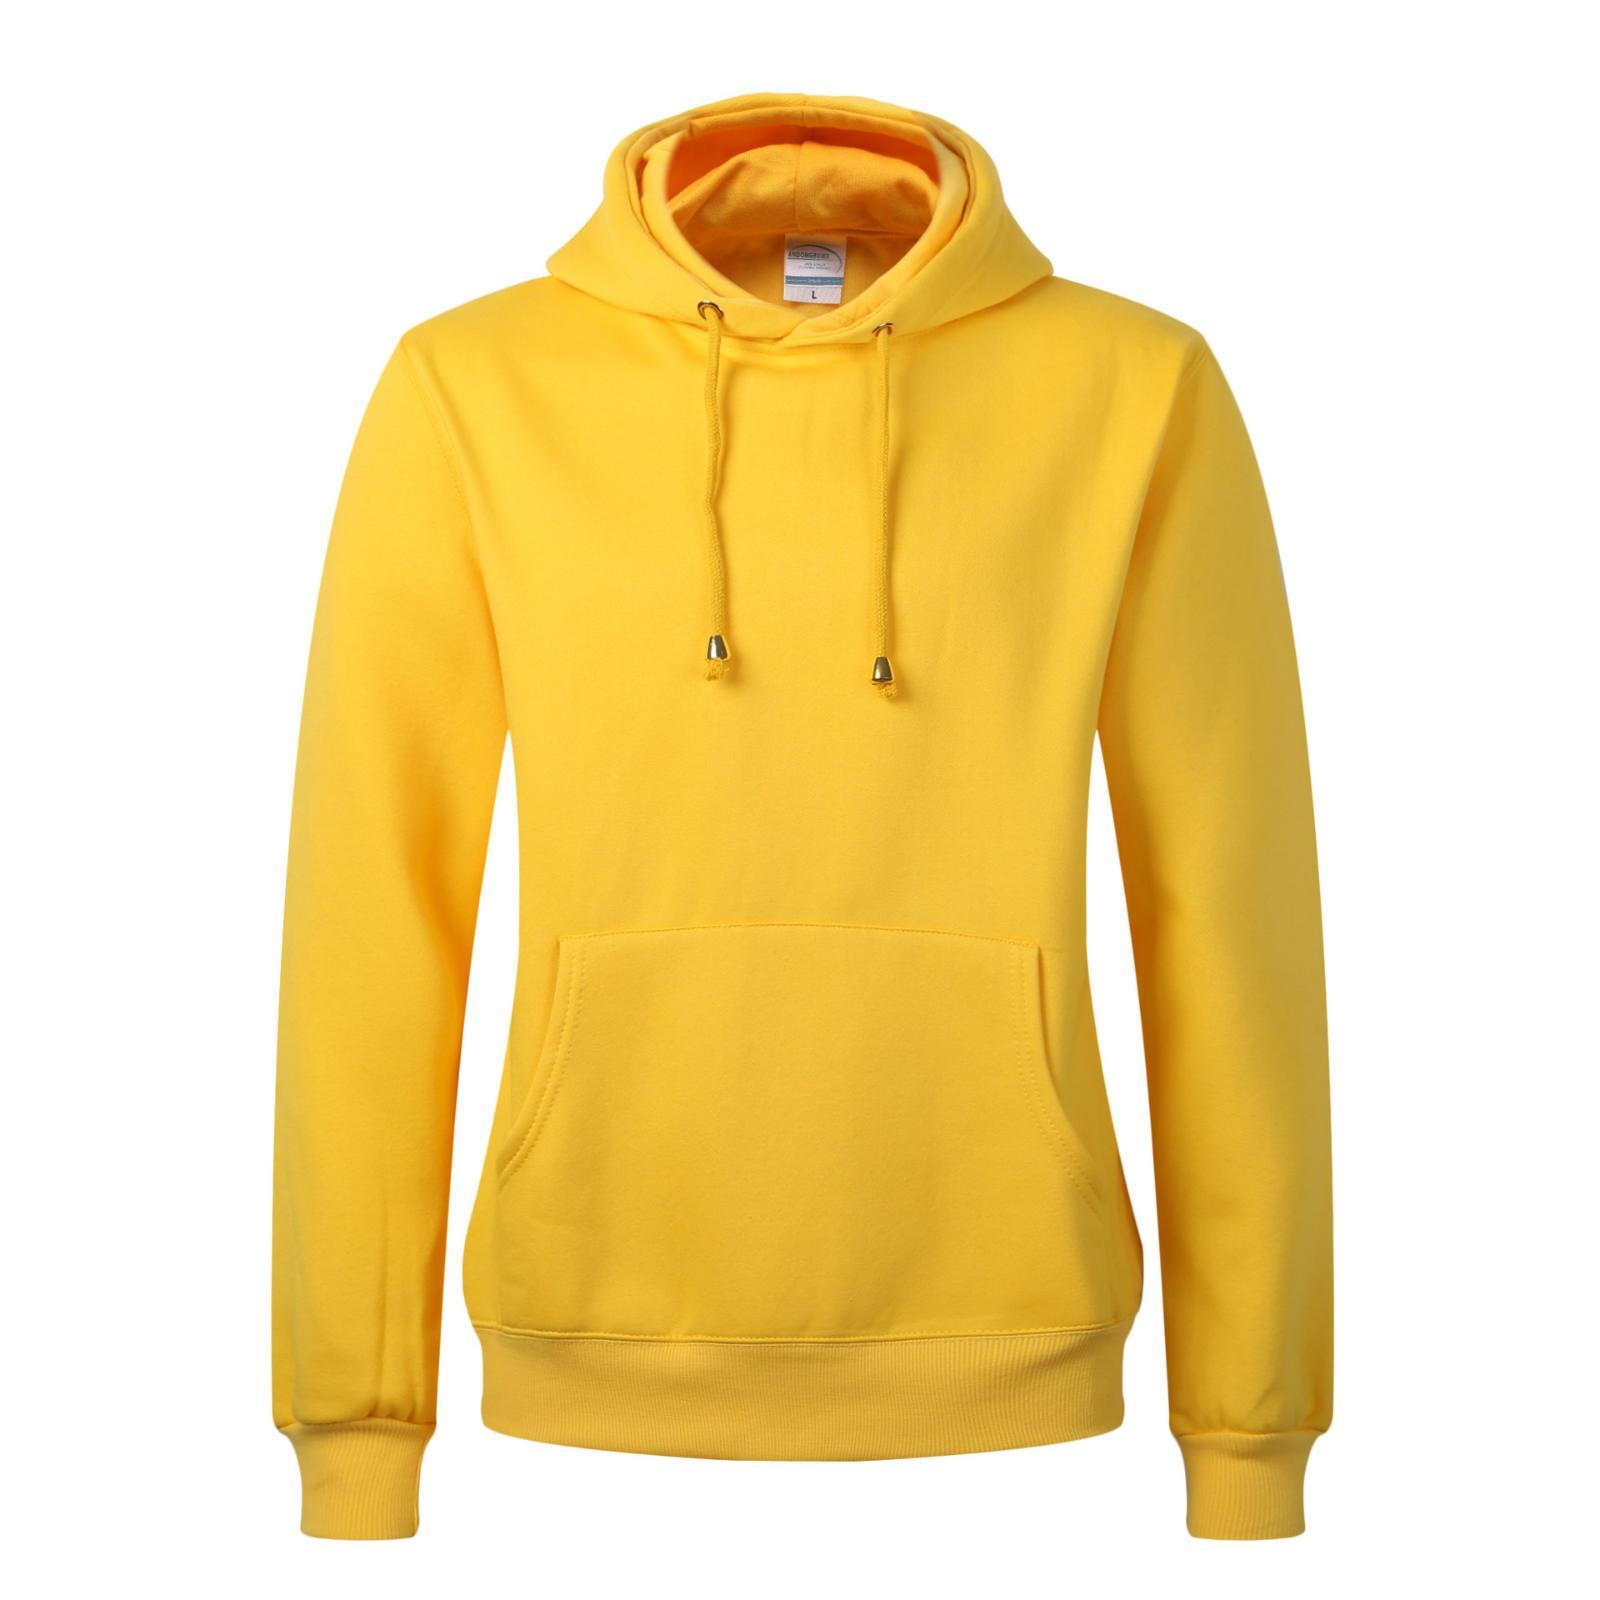 42a46c67fc6e Sudaderas para hombre 2019 Nueva chaqueta de sudadera con capucha casual de  AutumnWinter con bolsillo Moda Colores sólidos Tops multicolores Sudadera  ...